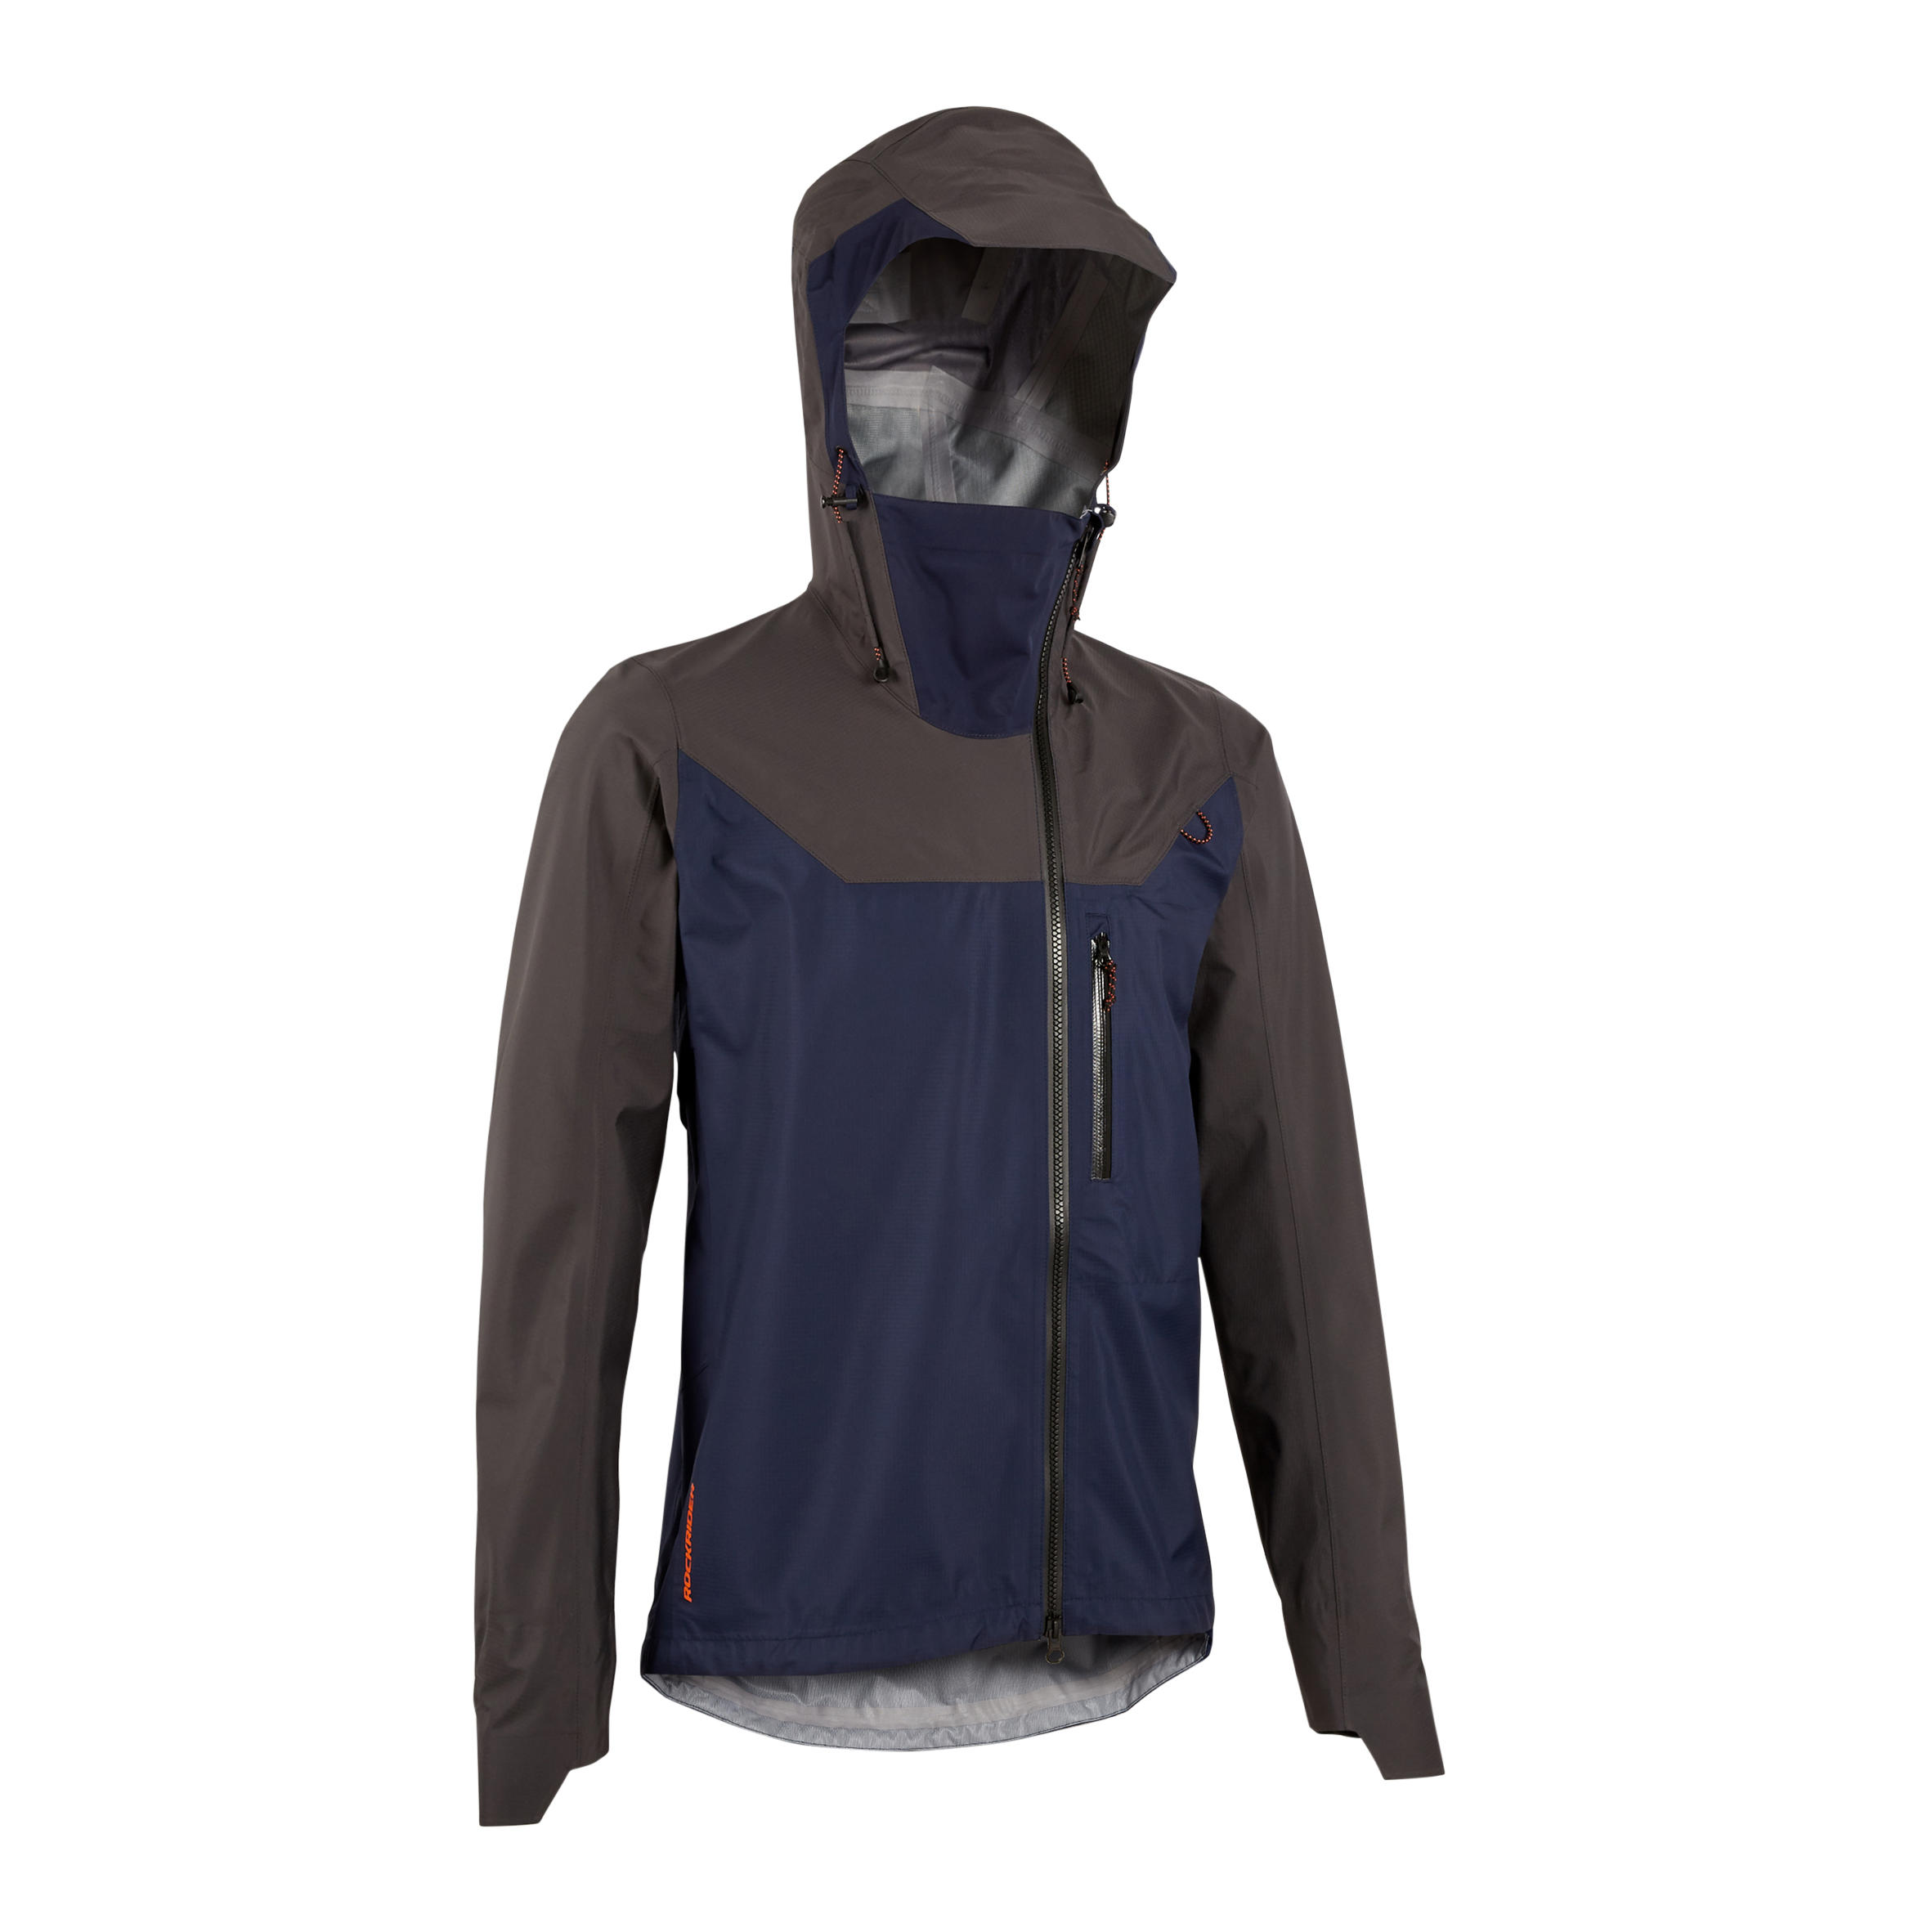 Jachetă impermeabilă MTB imagine